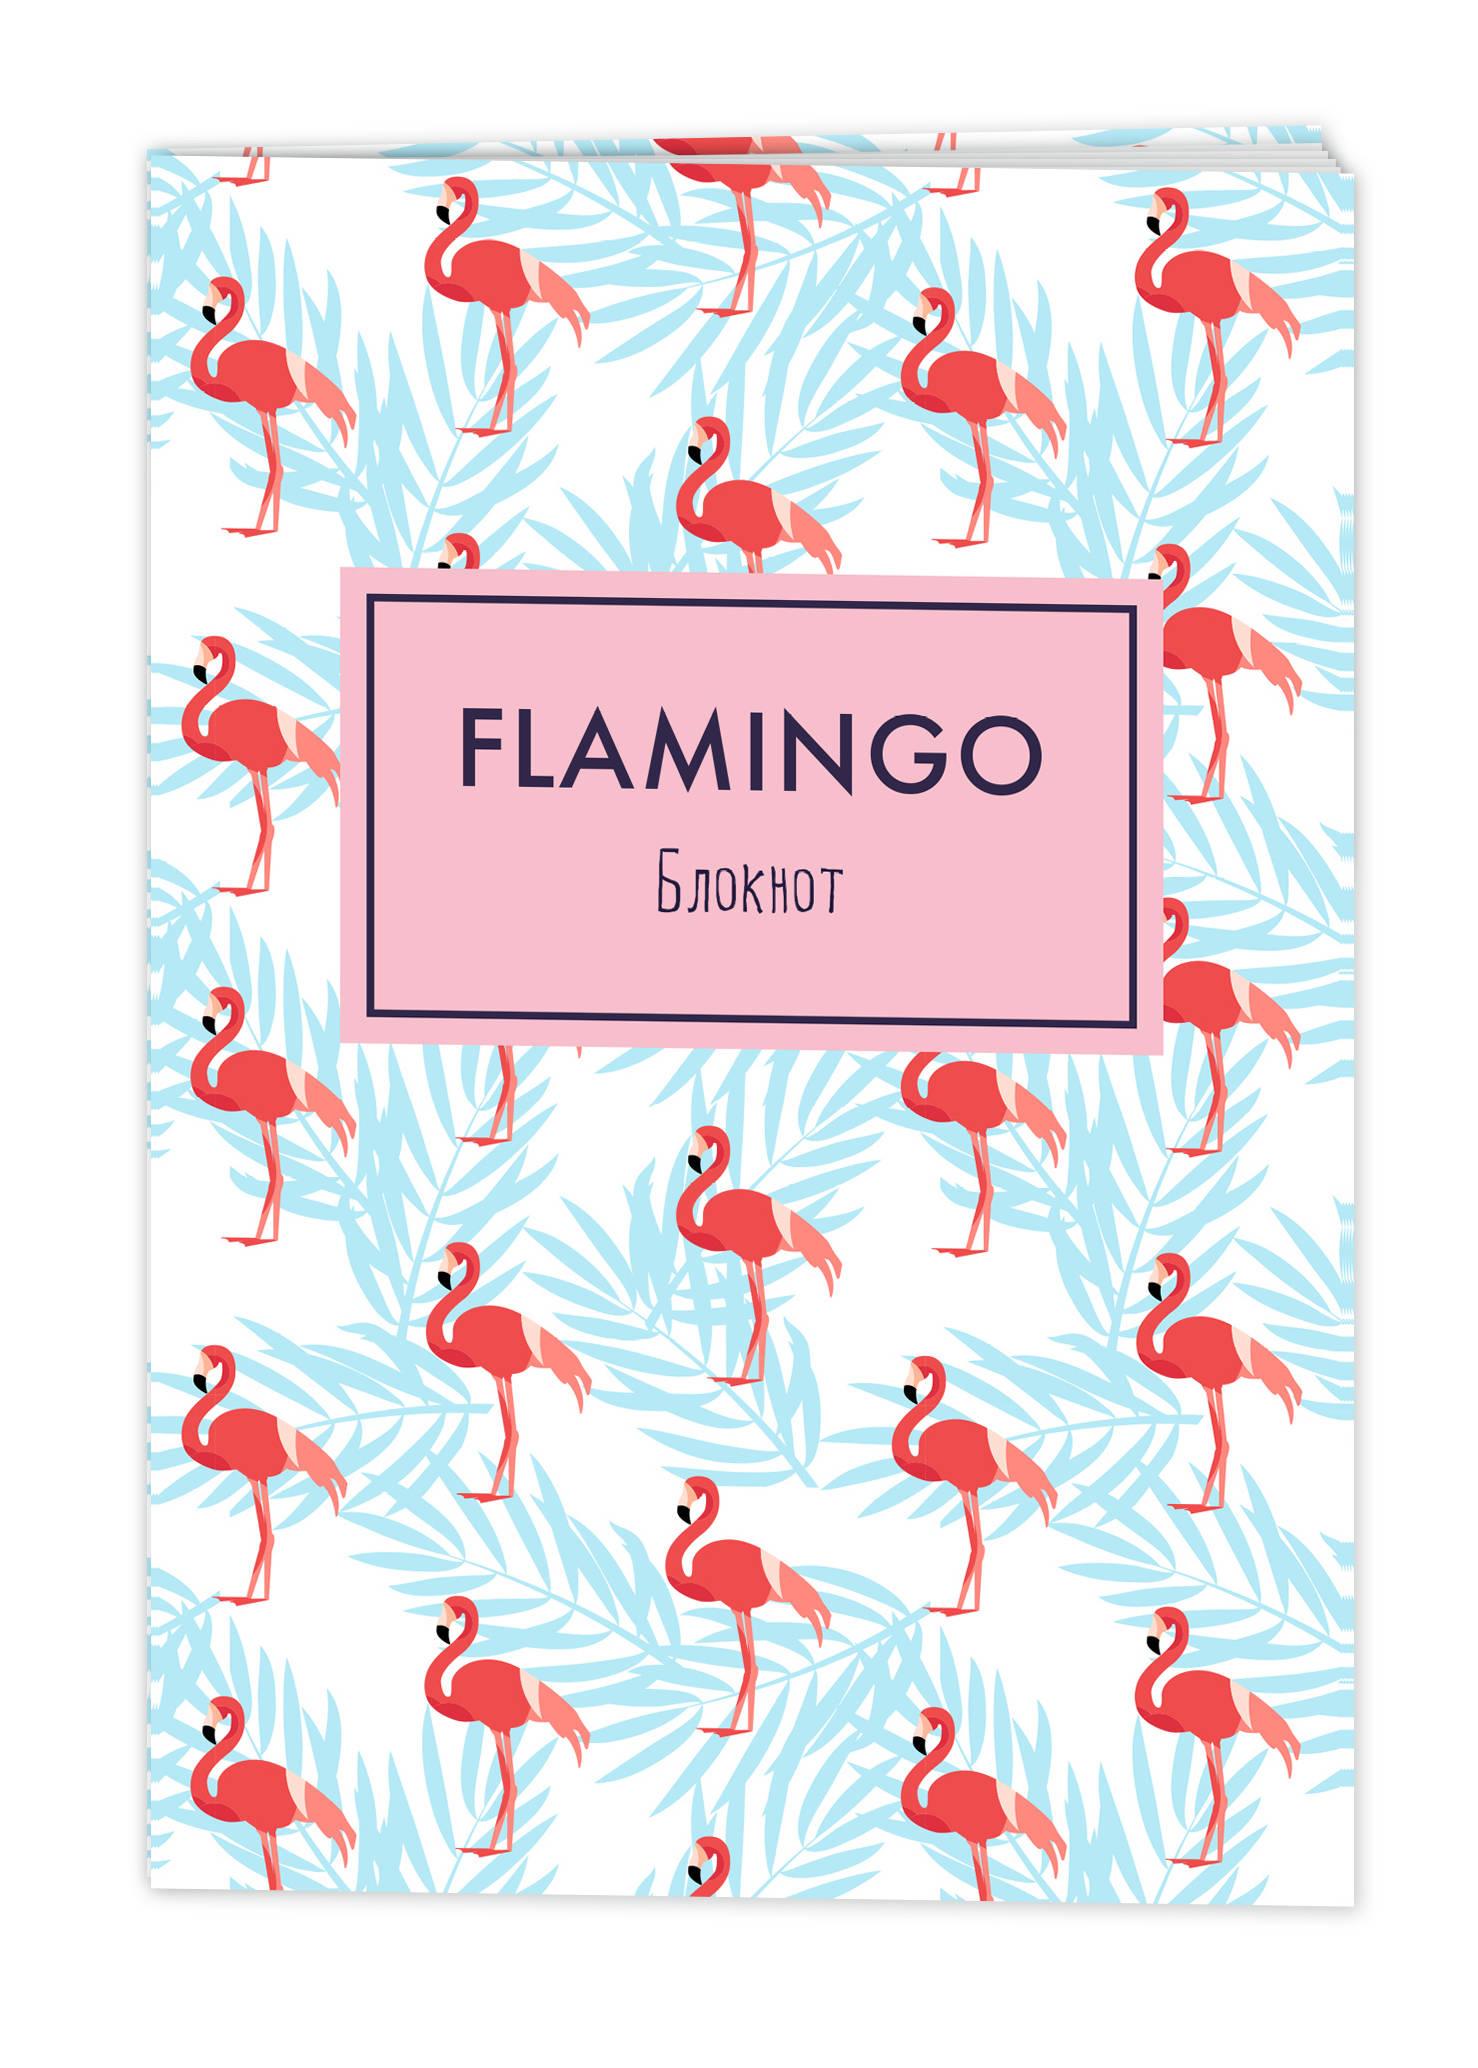 Блокнот. Mindfulness. Фламинго (формат А5, на скобе, фламинго на белом) (Арте) блокнот mindfulness фламинго формат а5 на скобе фламинго на белом 72 стр